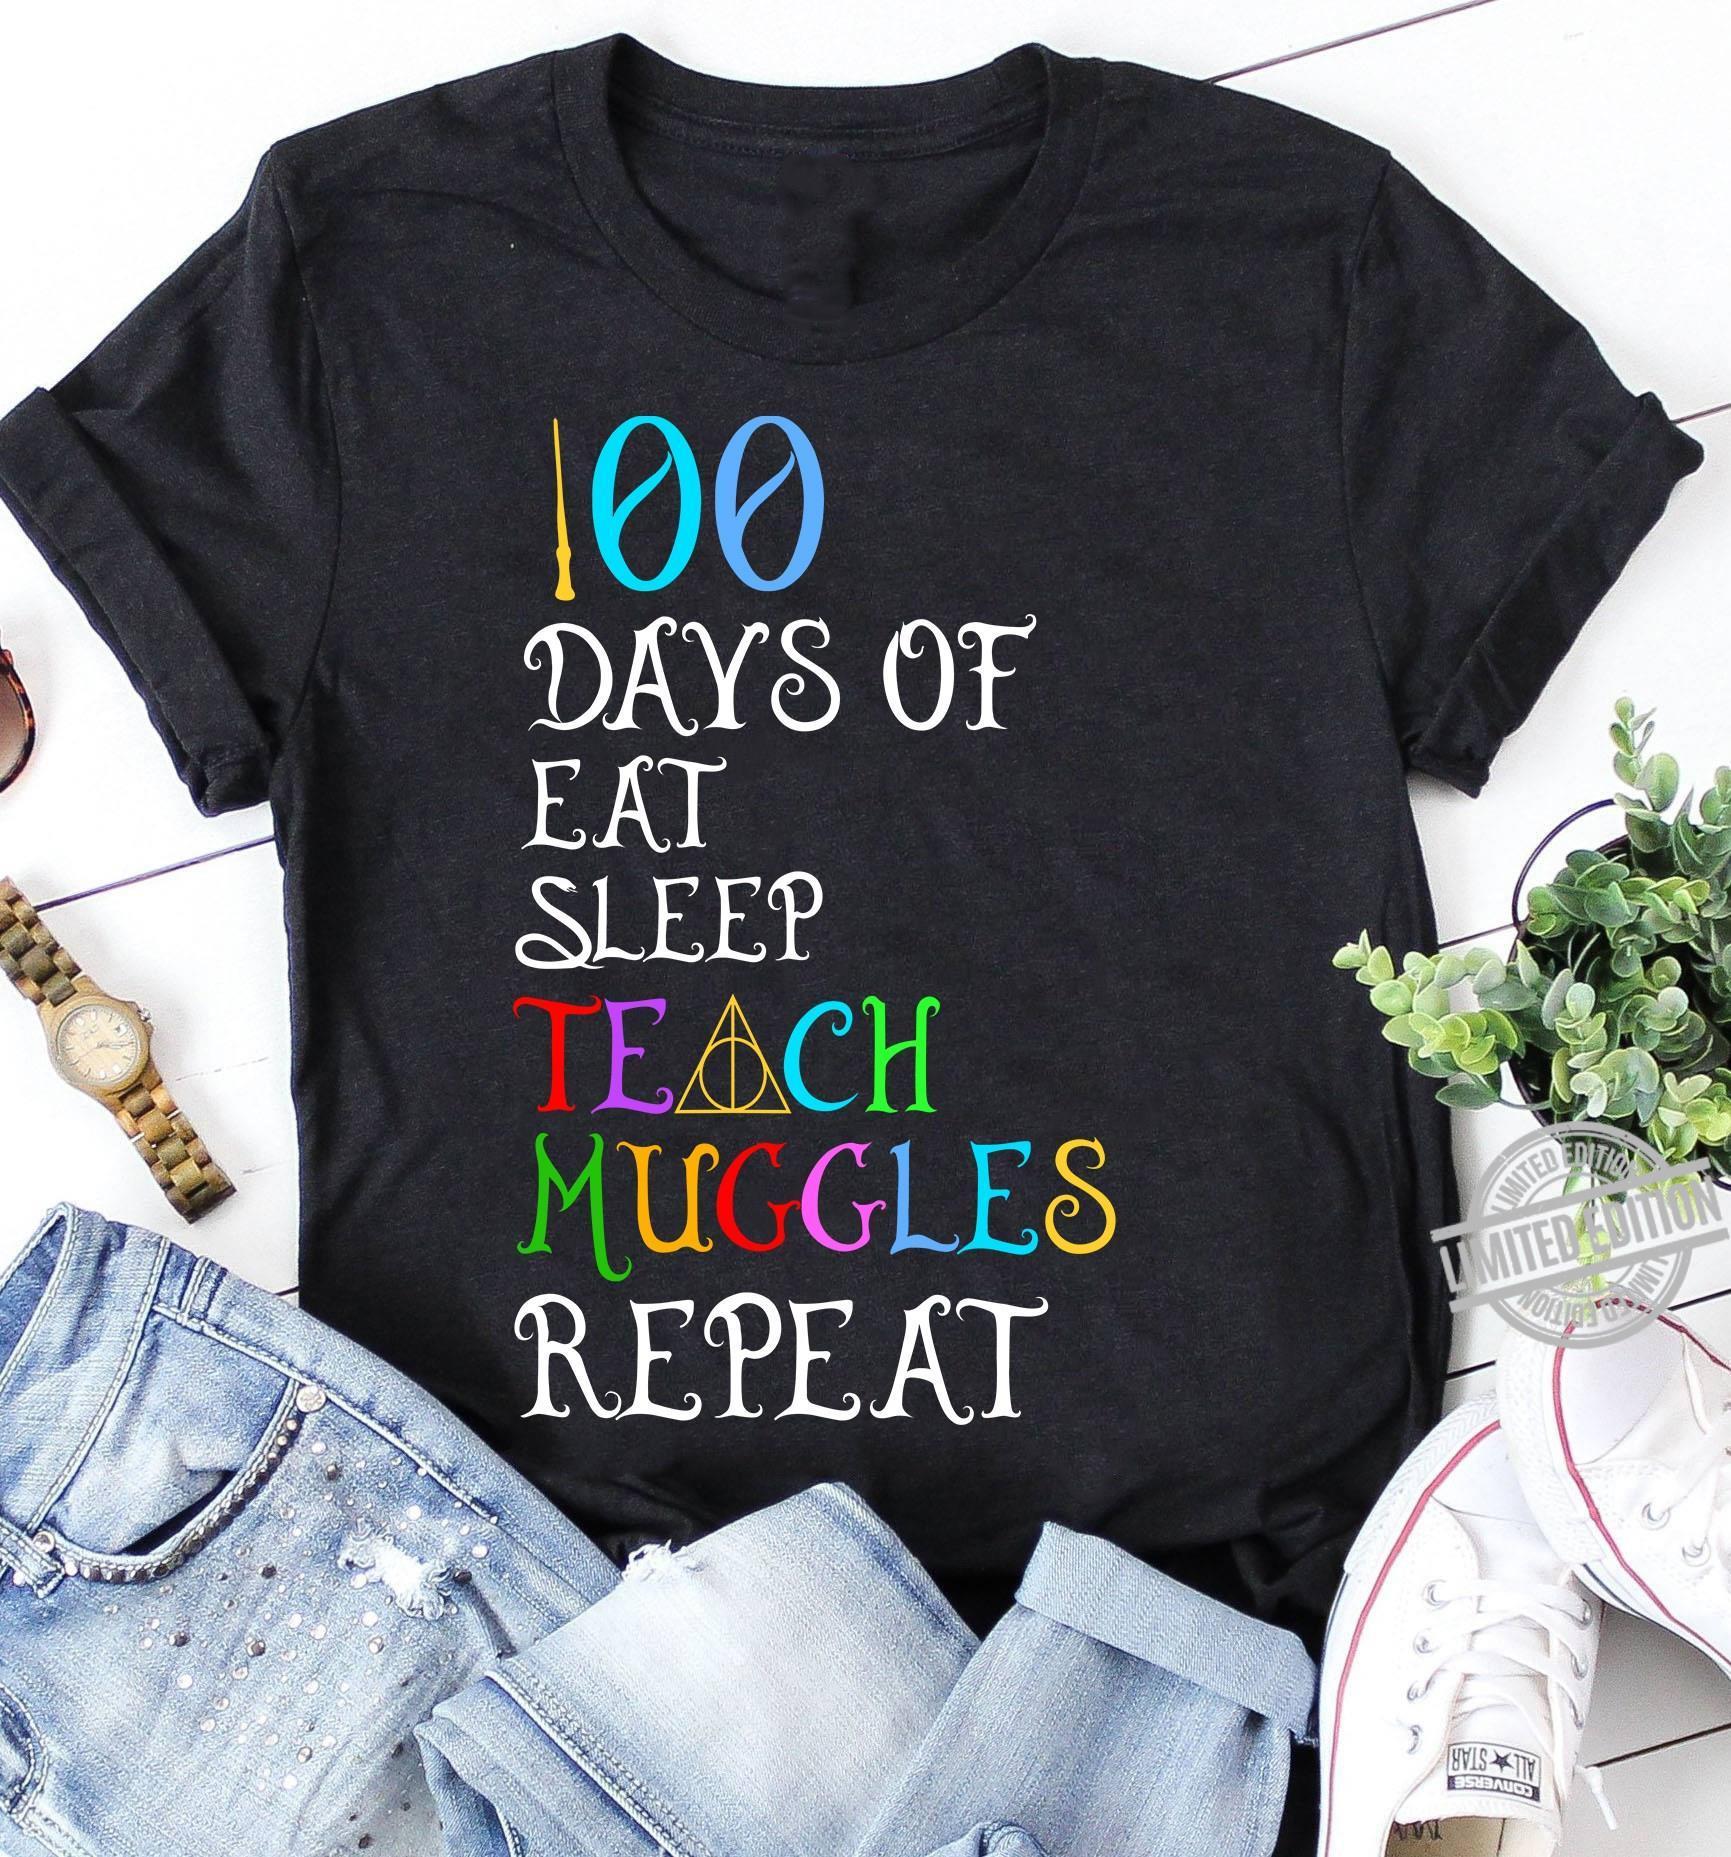 100 Days Of Eat Sleep Teach Muggles Repeat Shirt